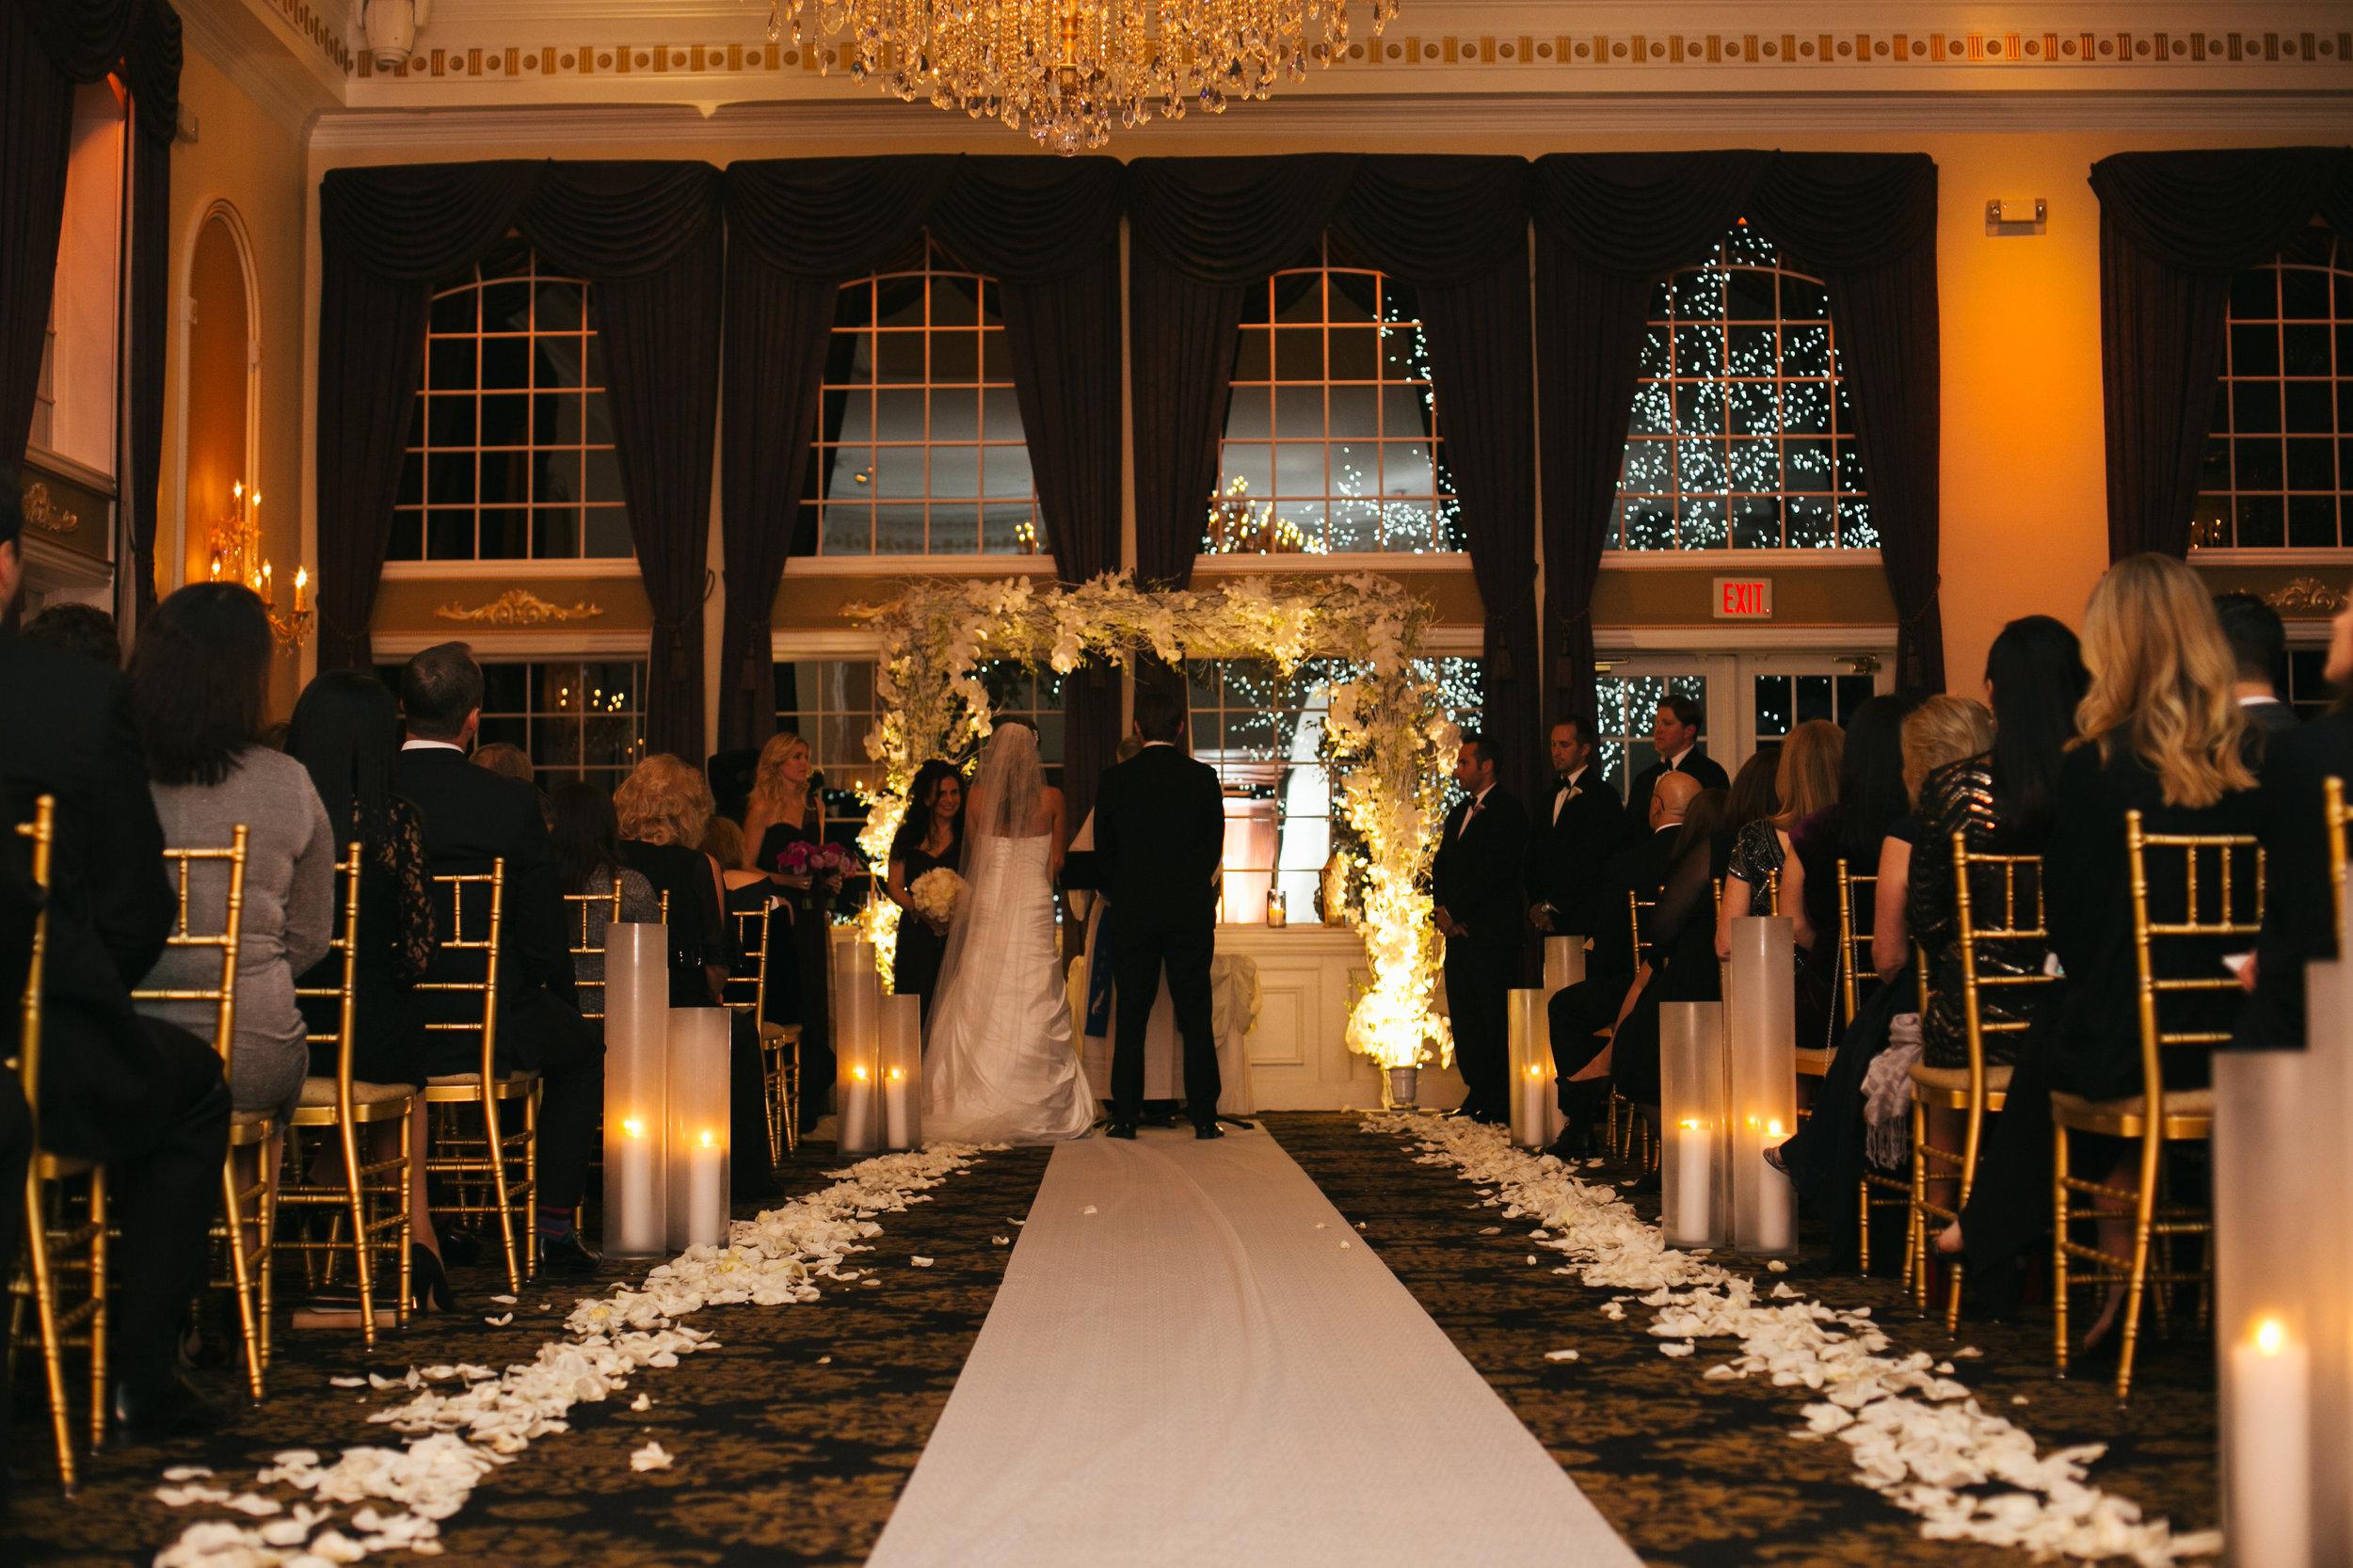 Ceci_New_York_Custom_Invitation_ New_Jersey_Wedding_Luxury_Personalized_Ceci_Style_Bride_Foil_Stamping45.jpg